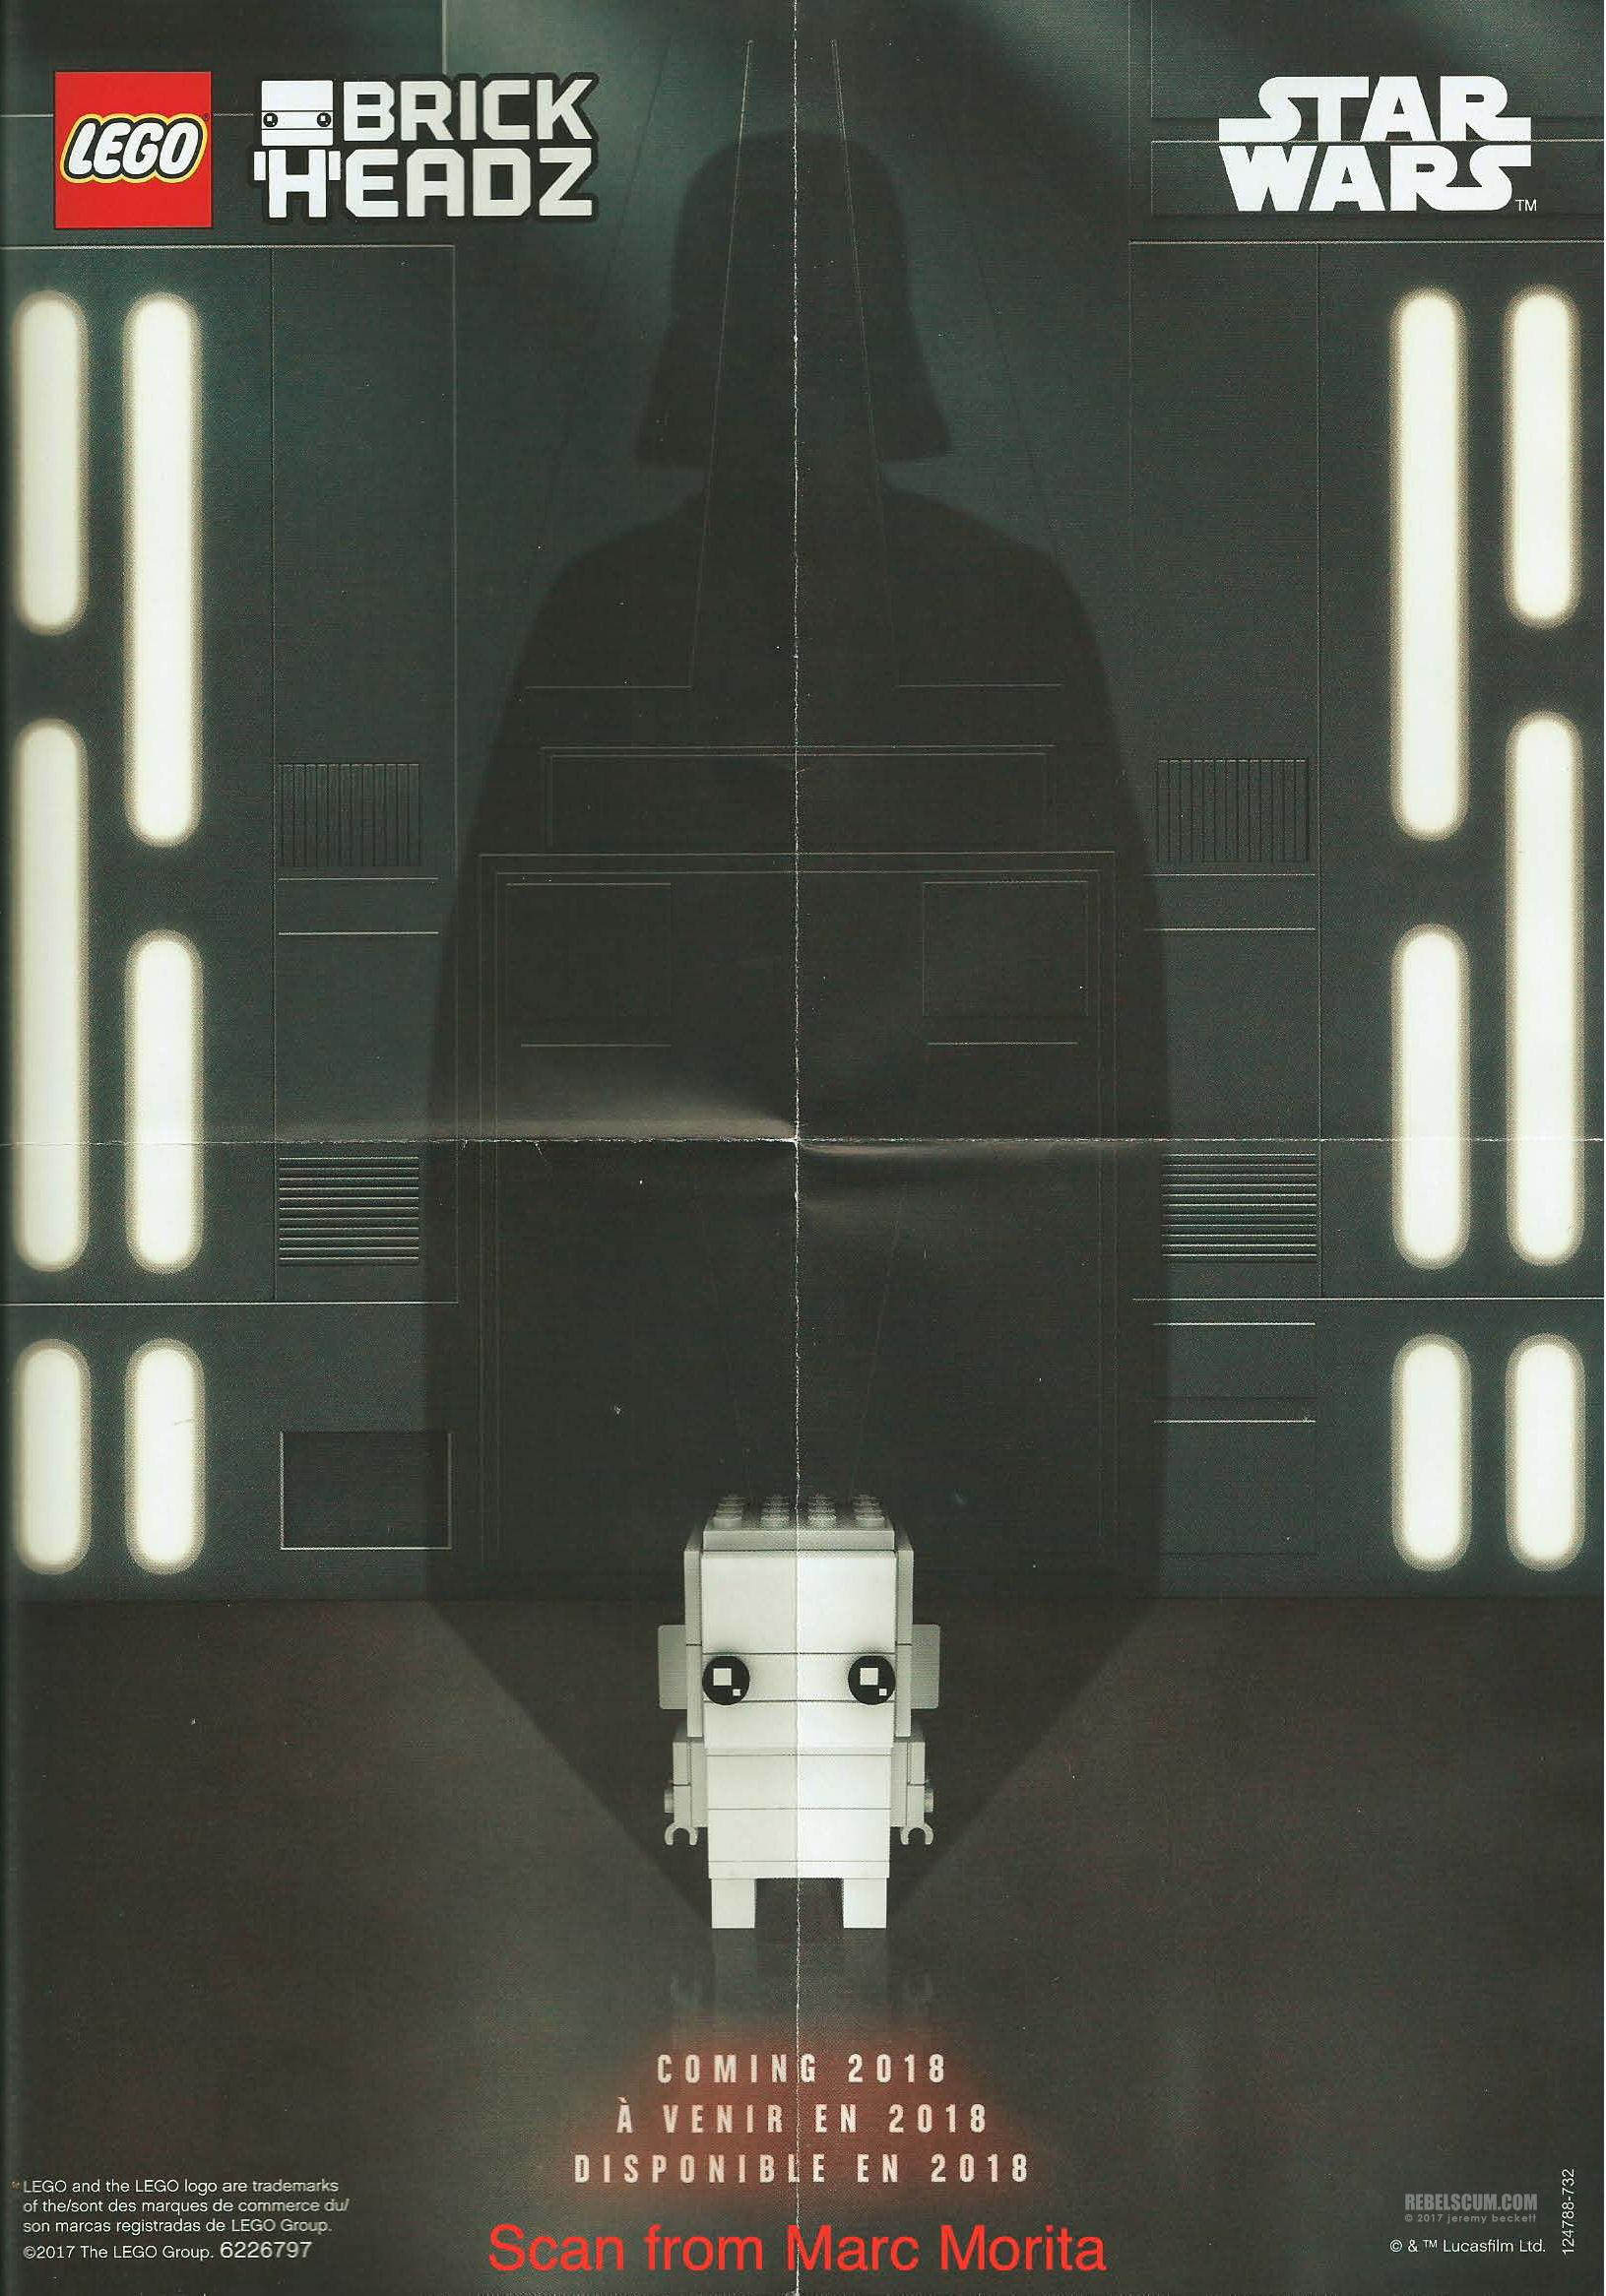 LEGO darth Vader brickheadz